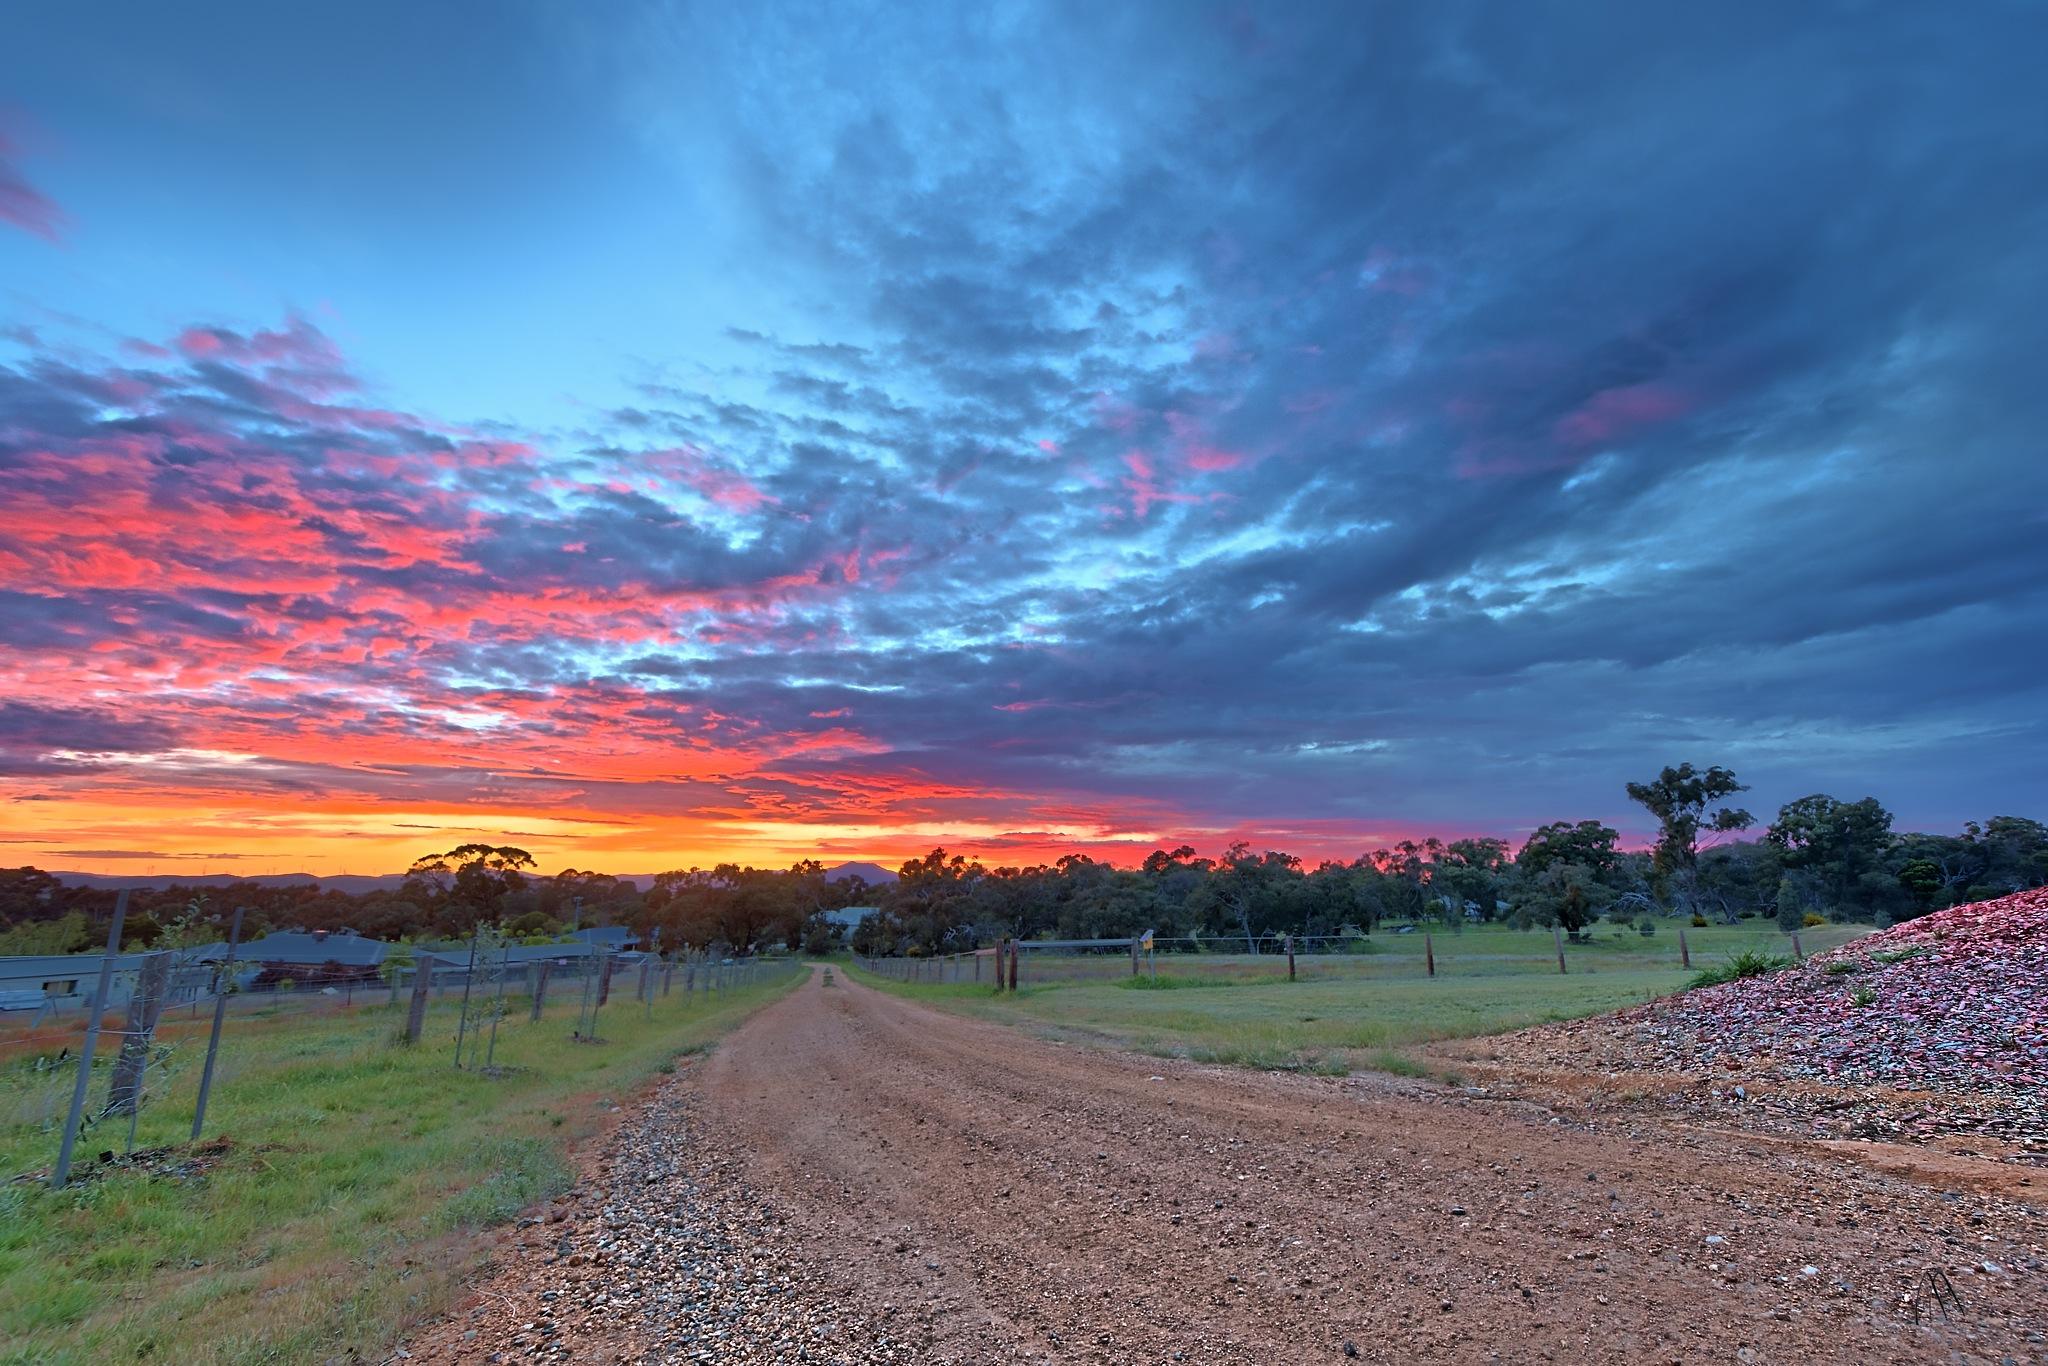 Fluffy Sunrise by Pieter Pretorius